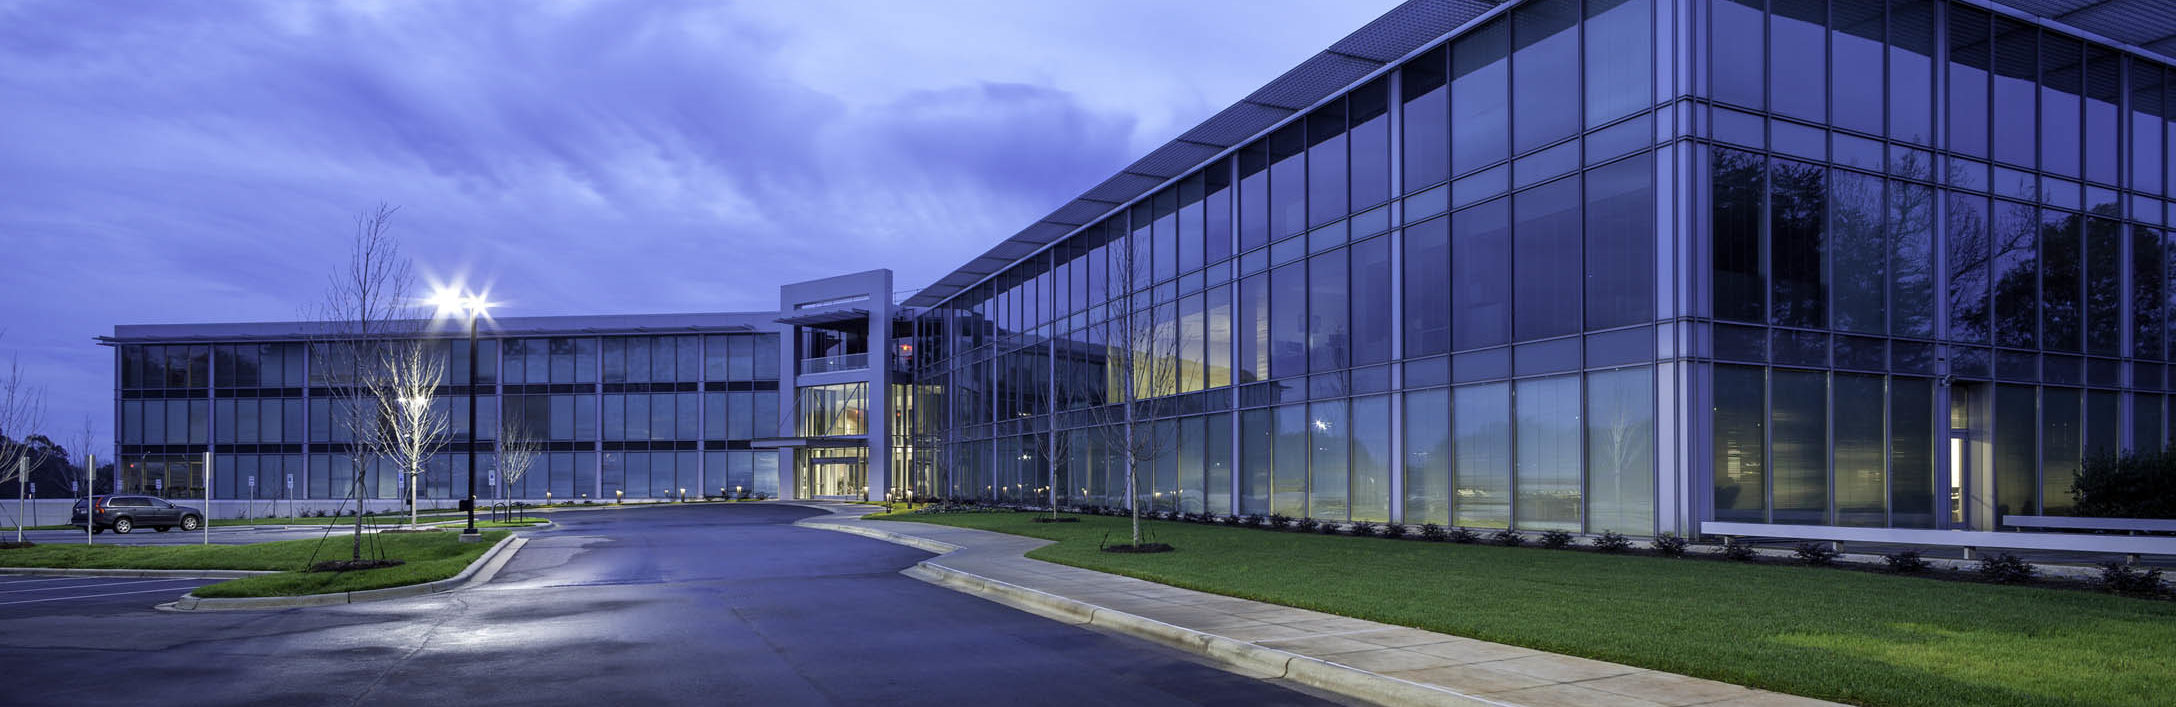 off broadway shoe warehouse corporate headquarters edifice